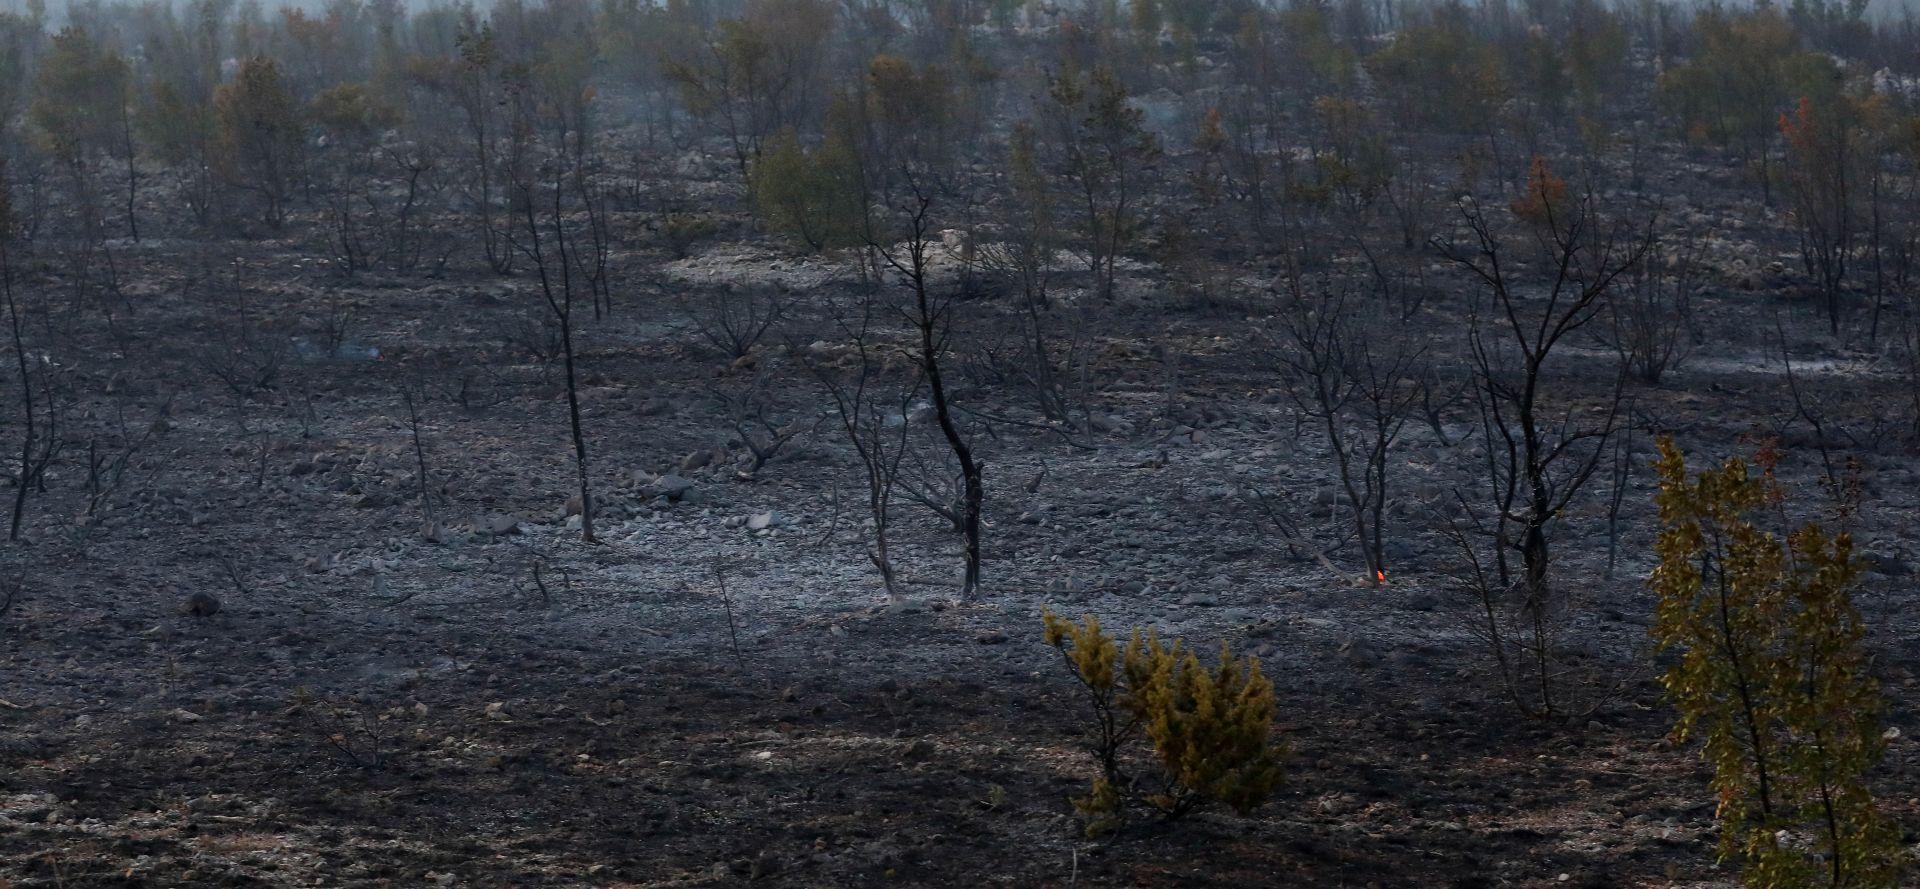 Ministarstvo pozvalo poljoprivrednike da se jave na natječaj za obnovu požarom uništenog potencijala